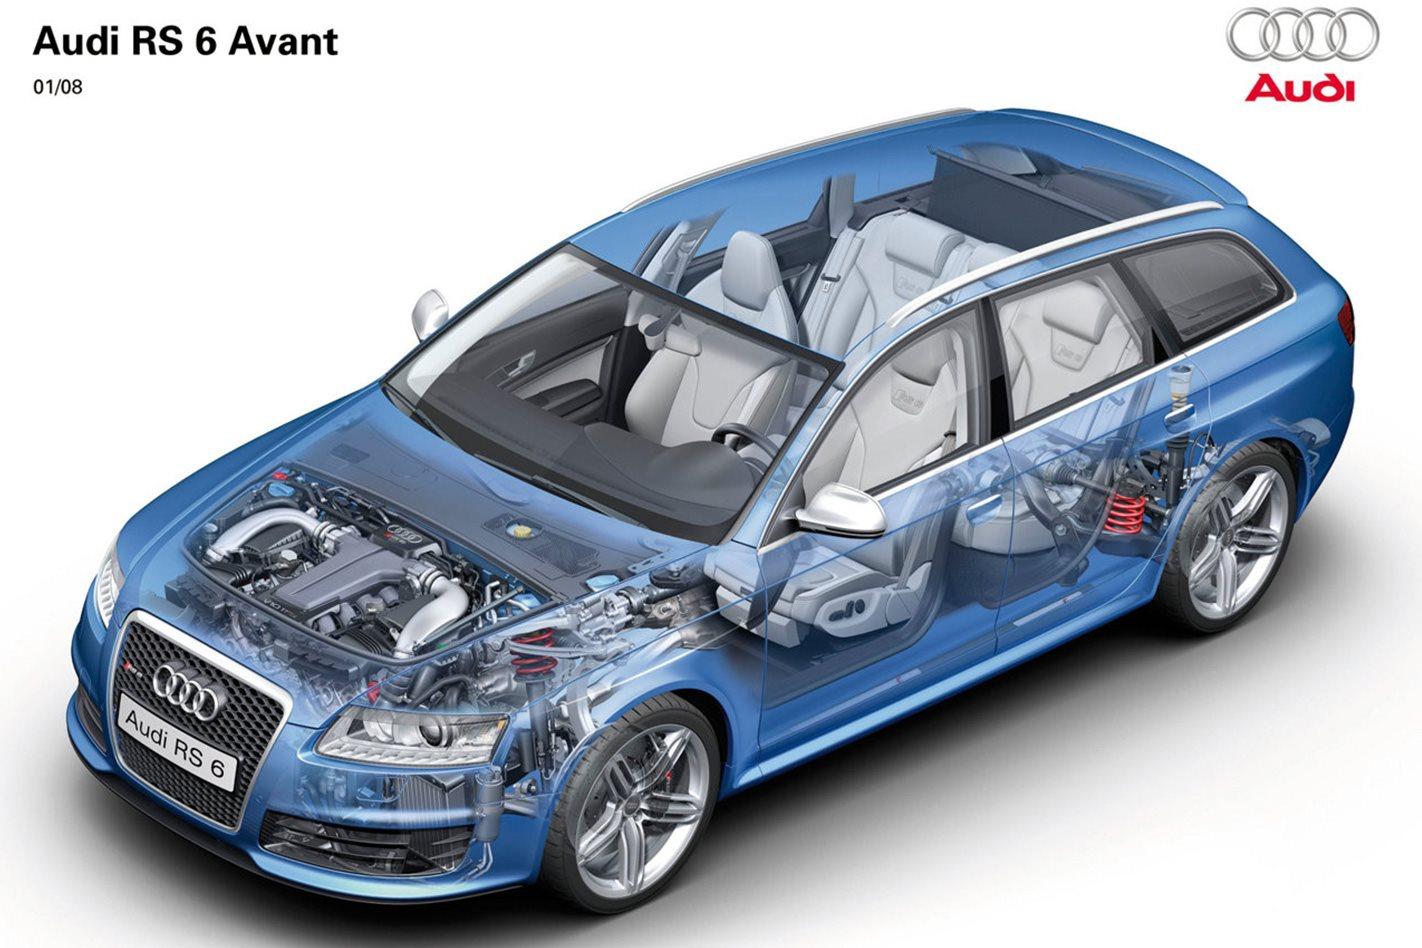 2008 Audi RS6 Avant design